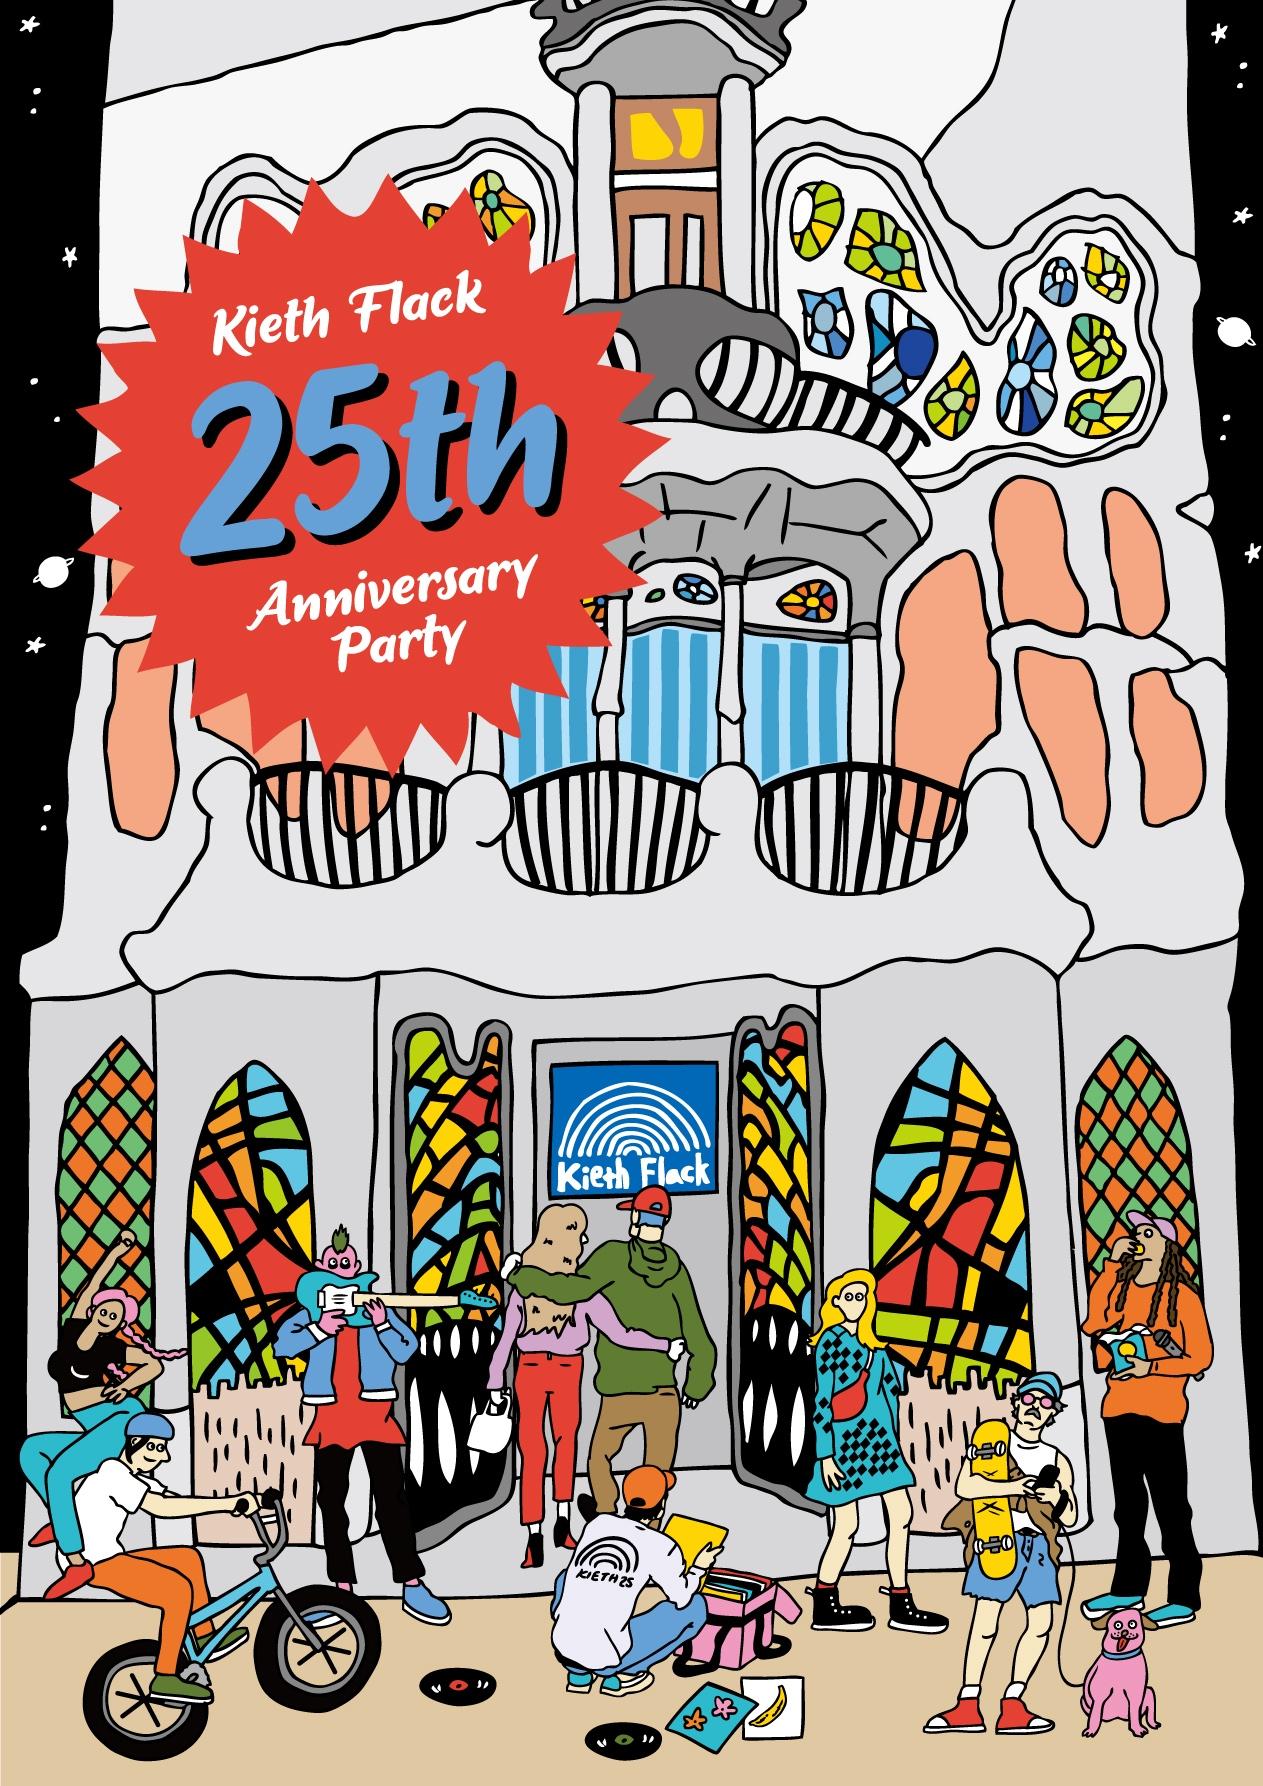 KIETH FLACK 25th ANNIVERSARY PARTY